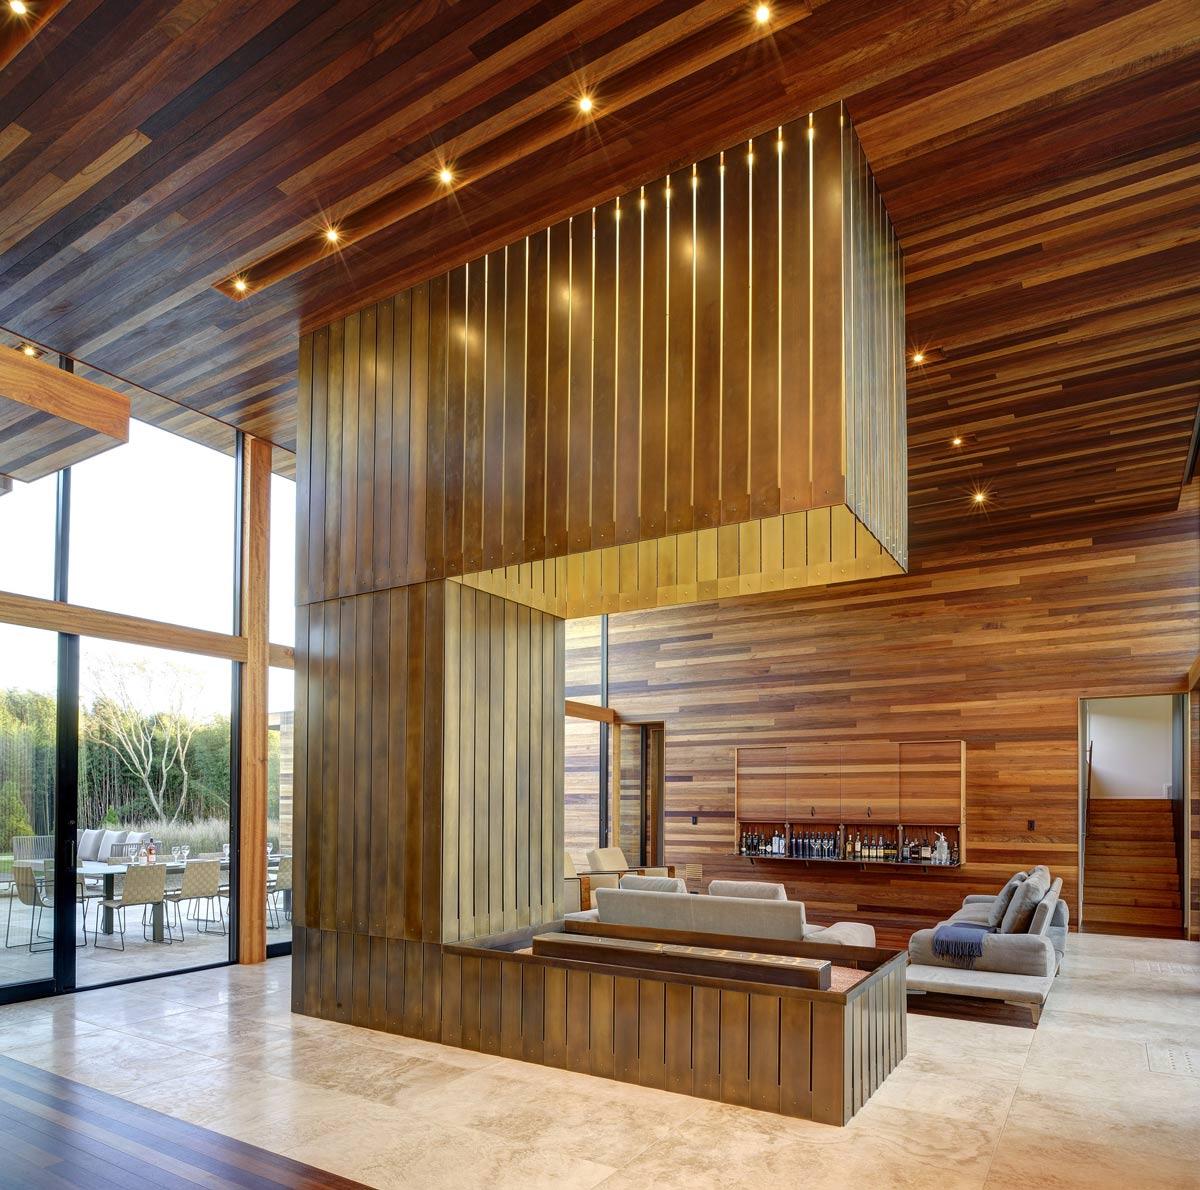 Modern Fireplace, Open Plan Living, Sam's Creek in Bridgehampton, New York by Bates Masi Architects